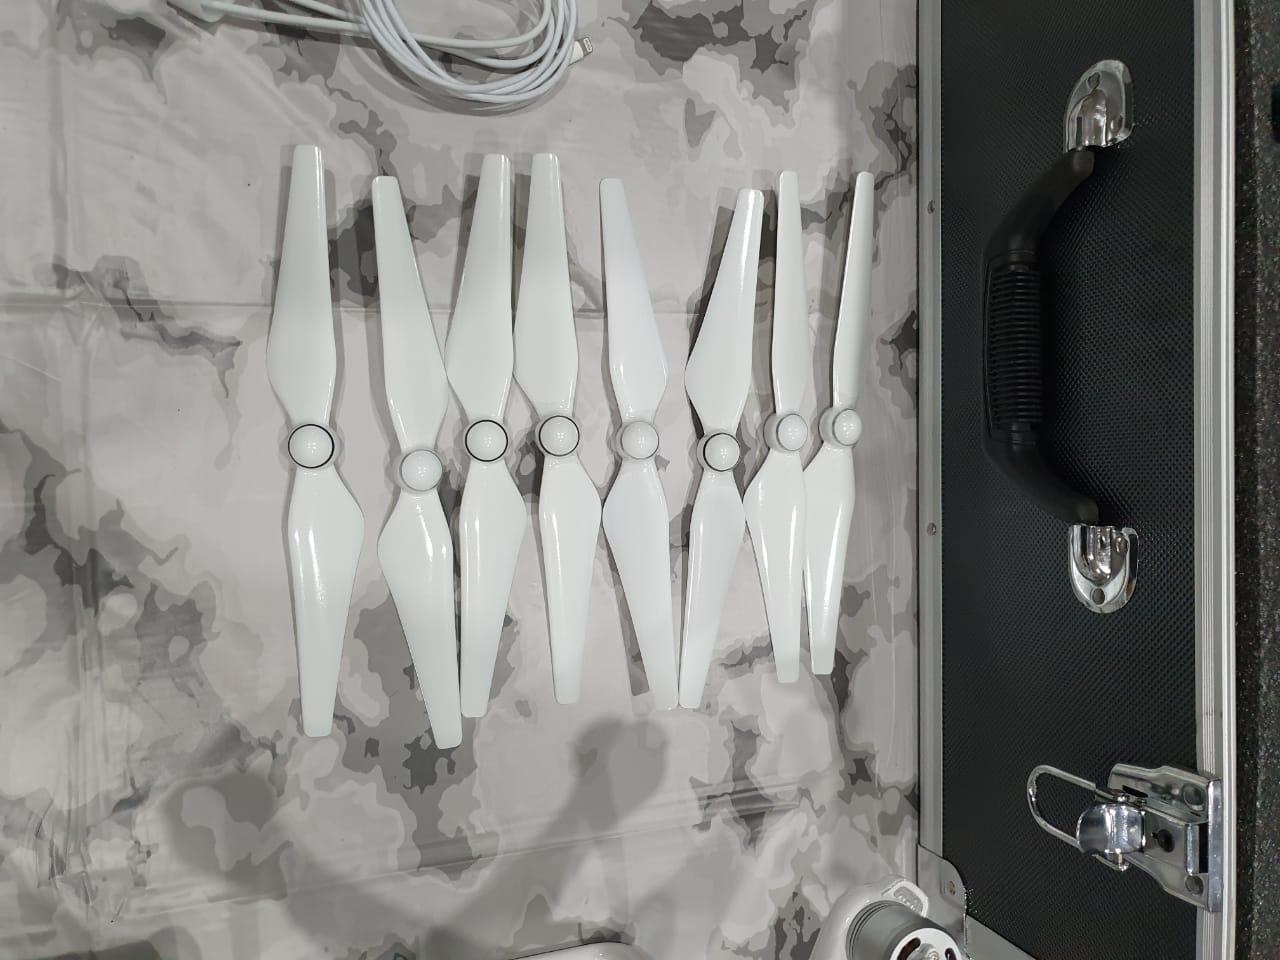 Phantom 4 Pro Drone incl Accessories